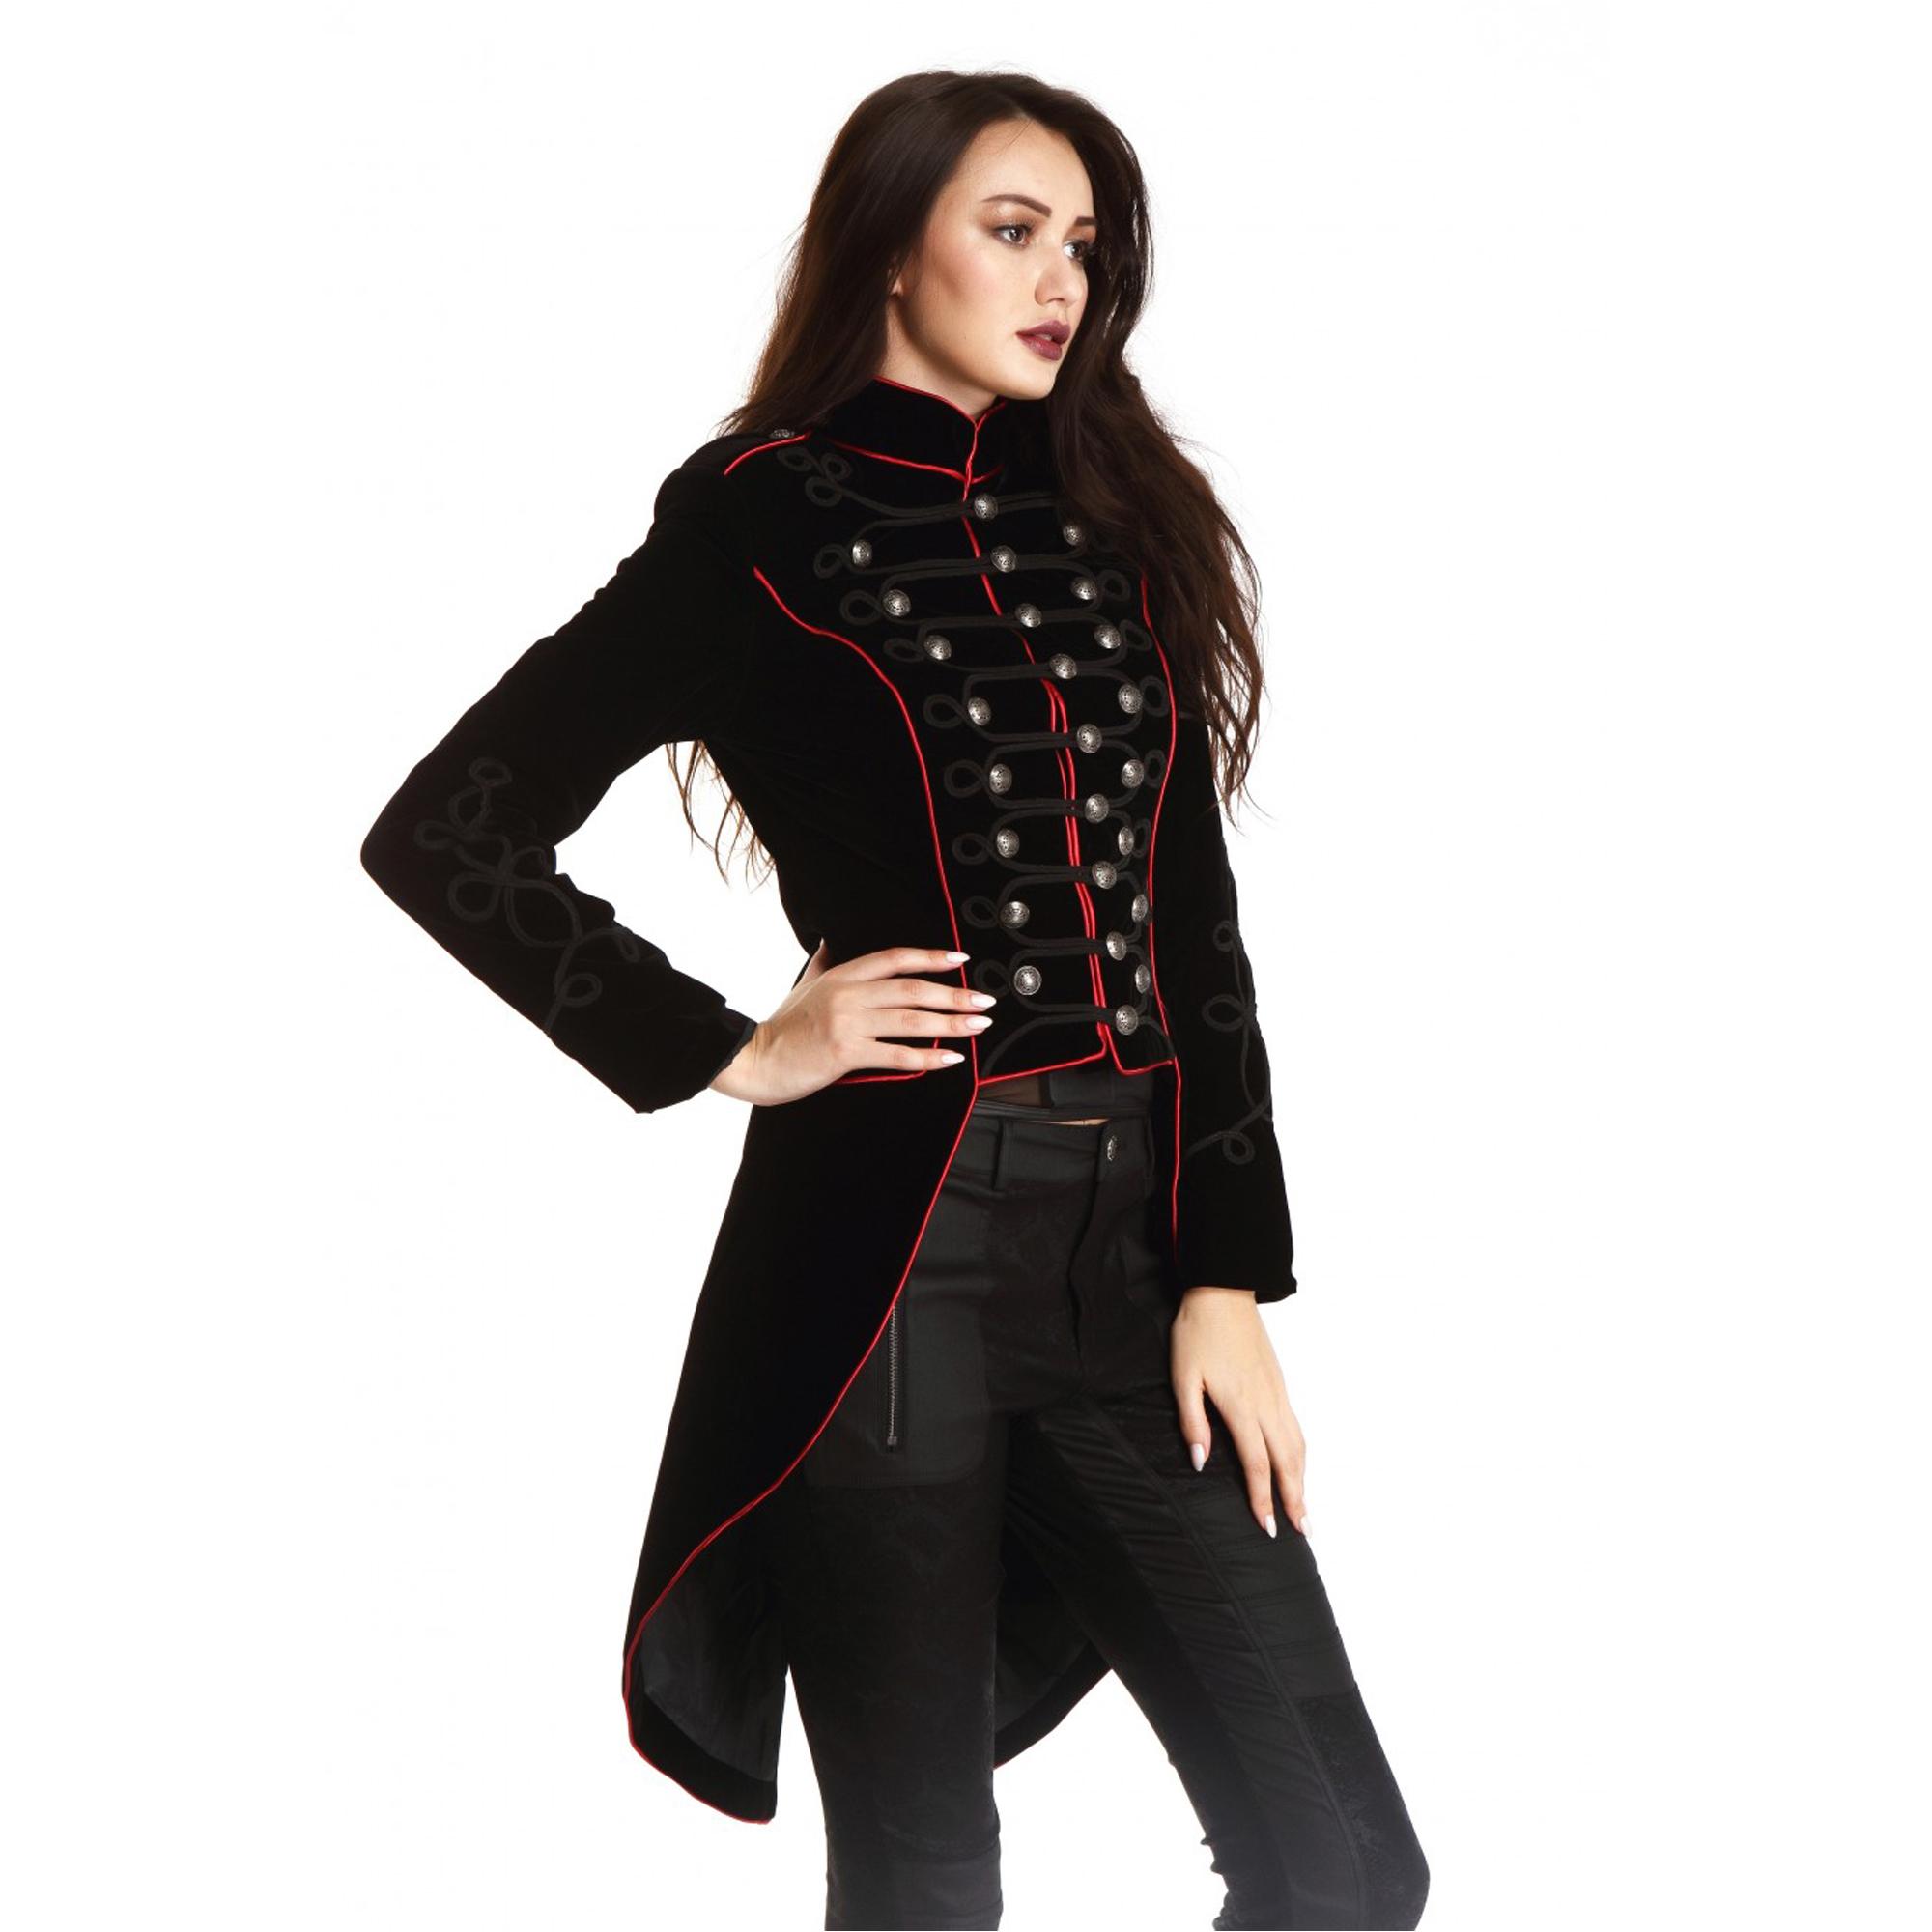 "Women's Black Gothic Steampunk ""Pentagramme"" Military-style Jacket"